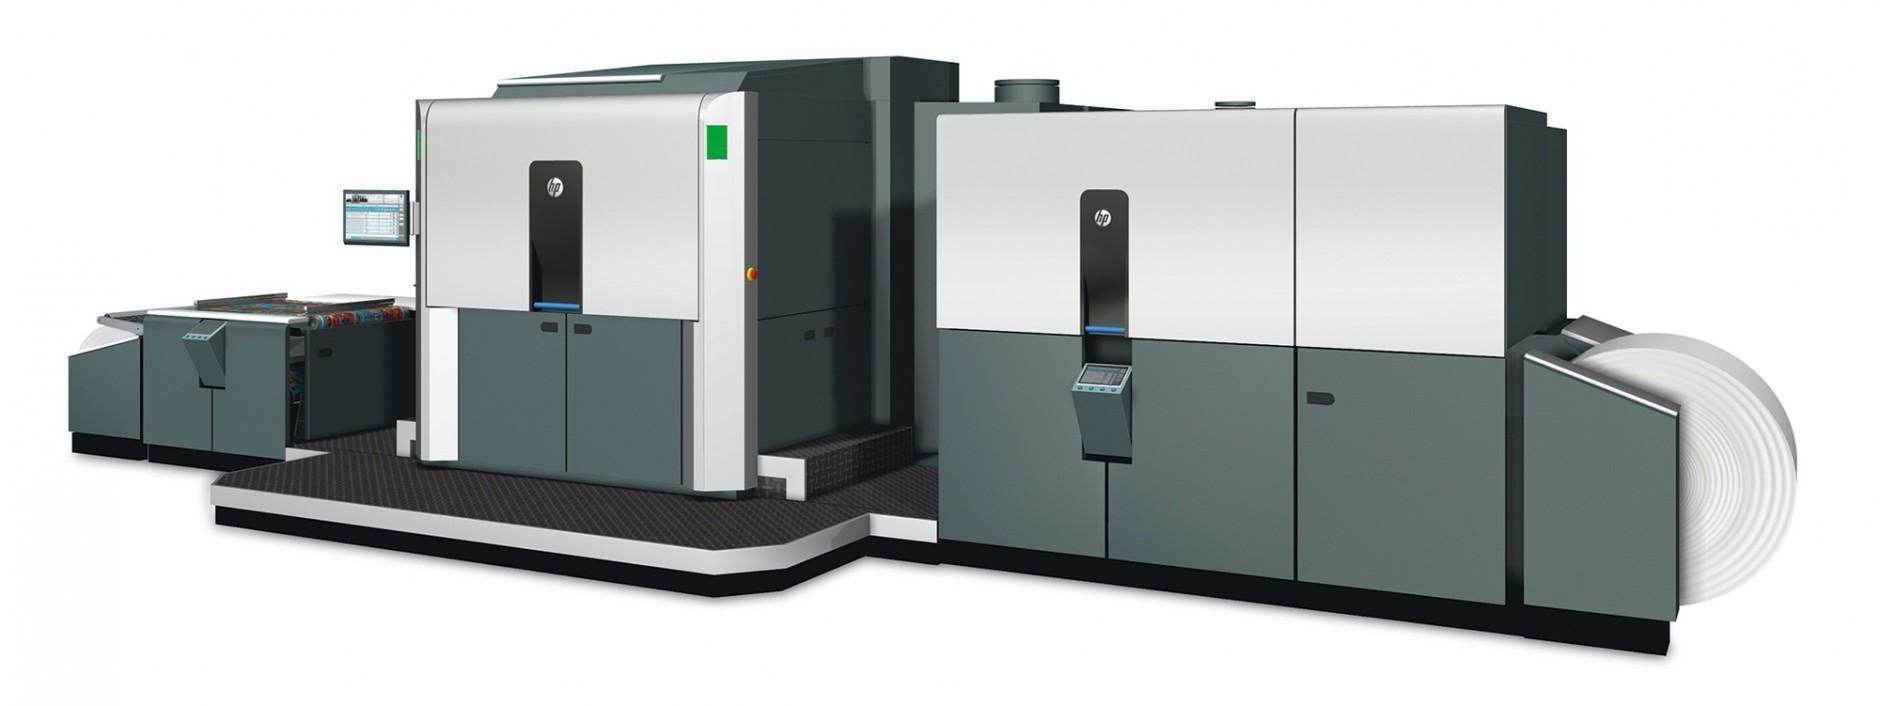 Digitaldruck, HP Indigo 20000